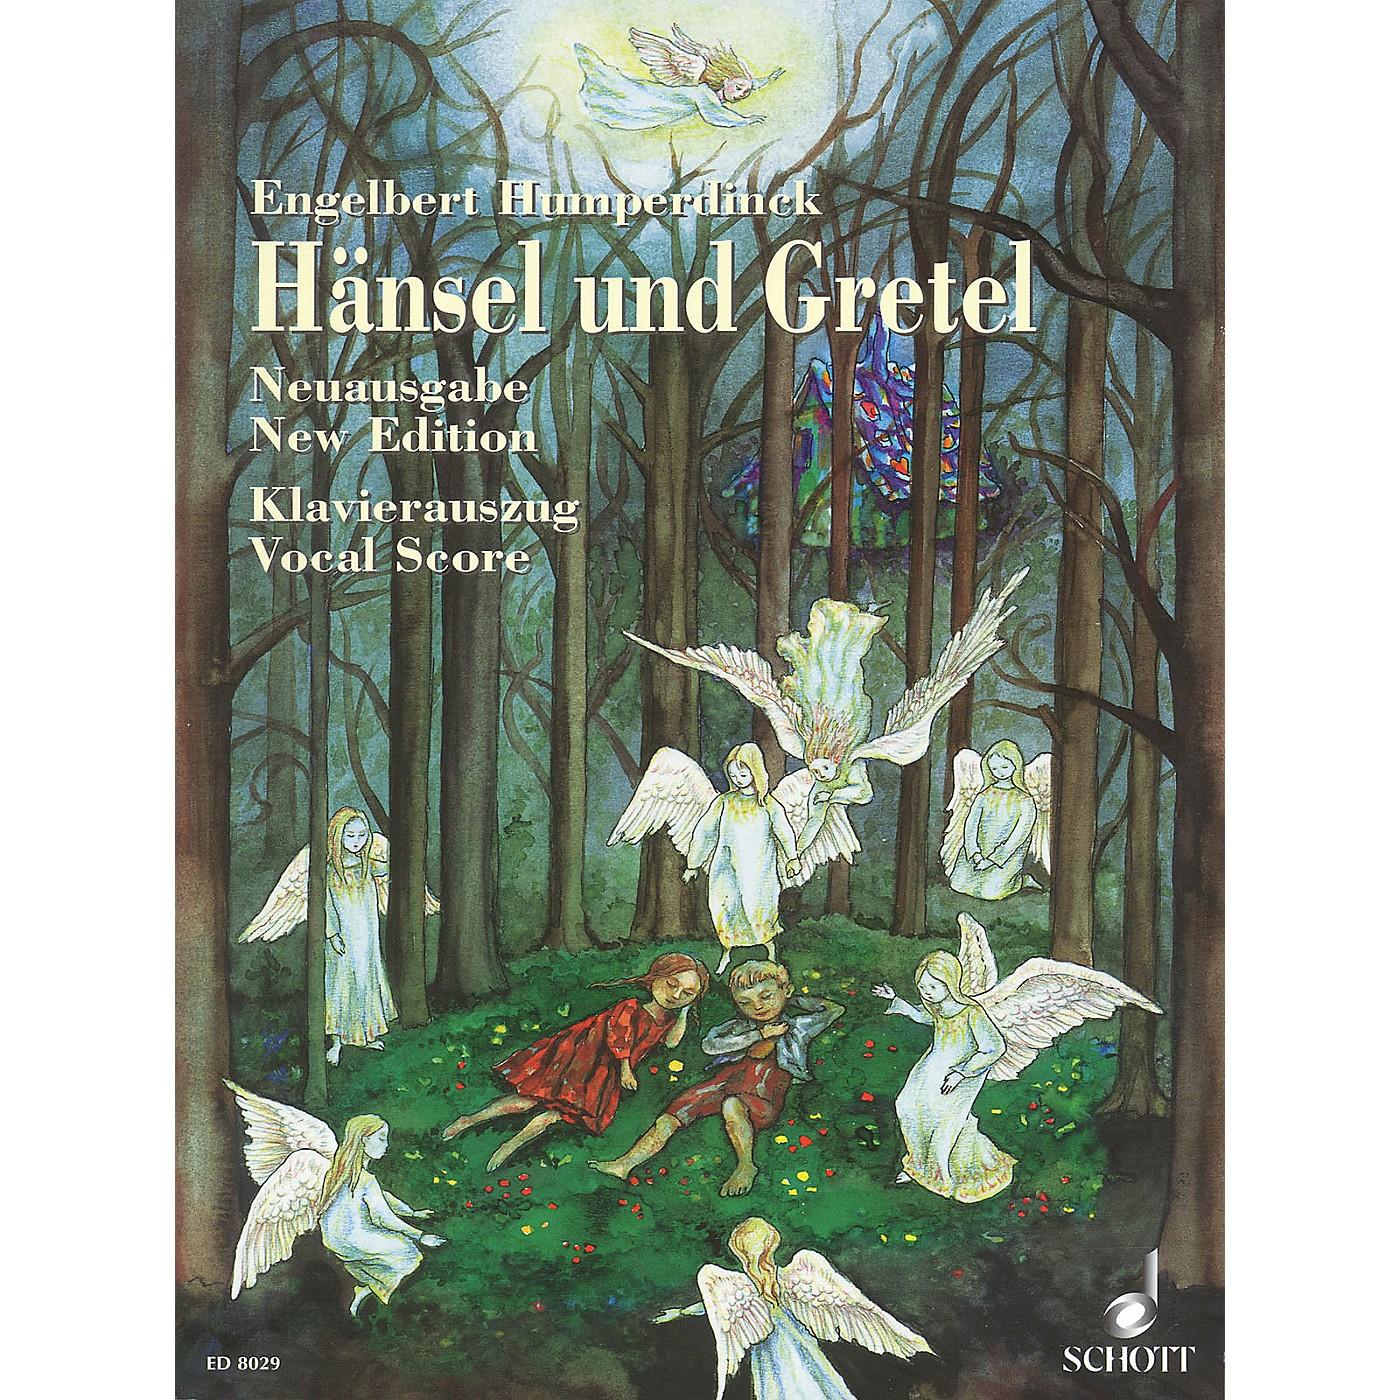 Schott Hansel und Gretel (Fairy-tale Opera in Three Acts) Vocal Score Composed by Engelbert Humperdinck thumbnail